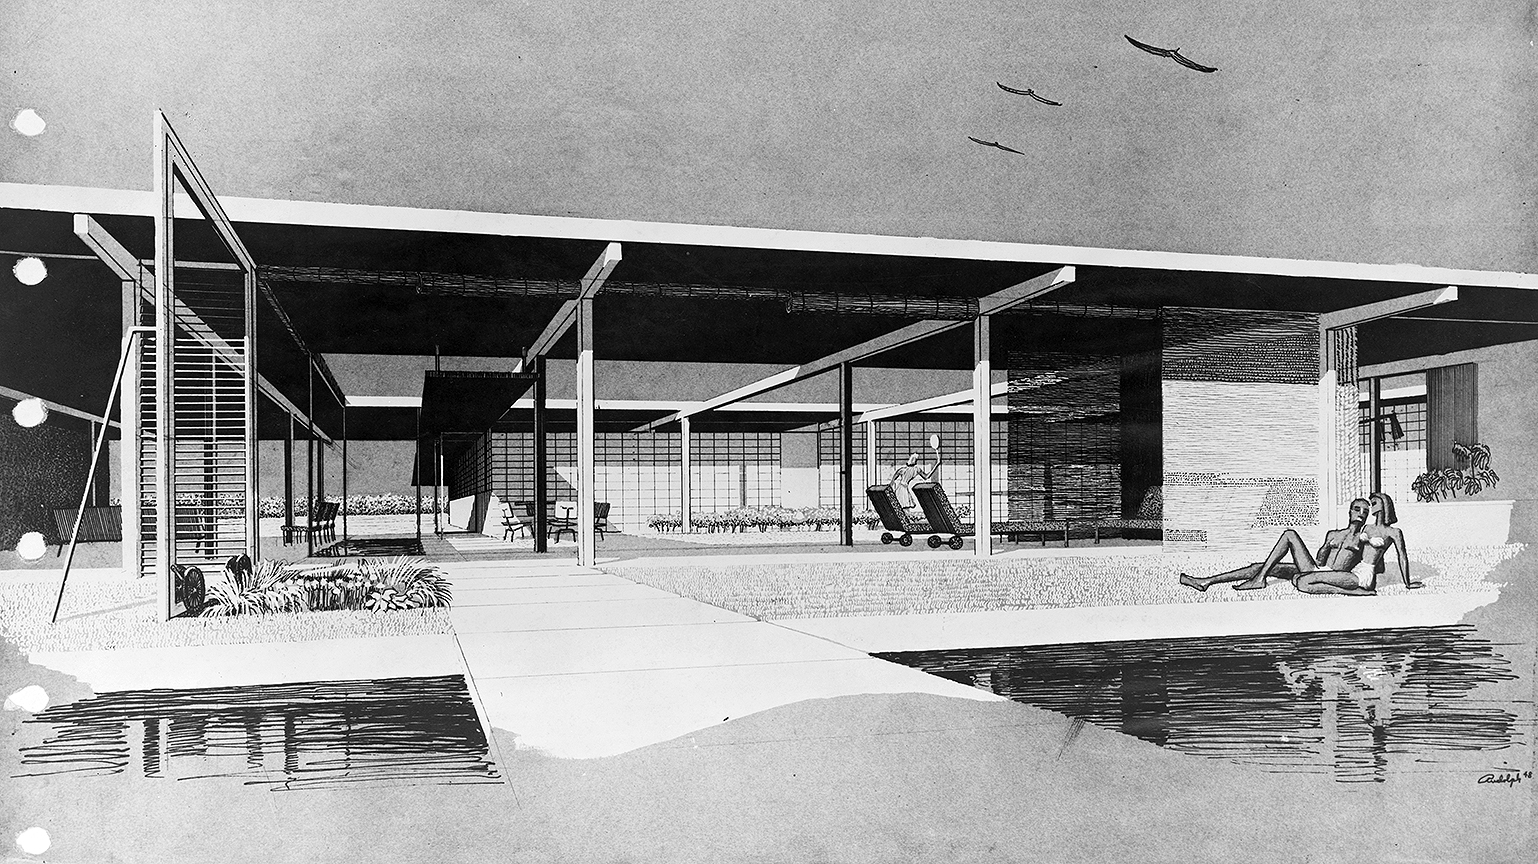 Goar Residence, Sarasota, Florida. Exterior Perspective Rendering.